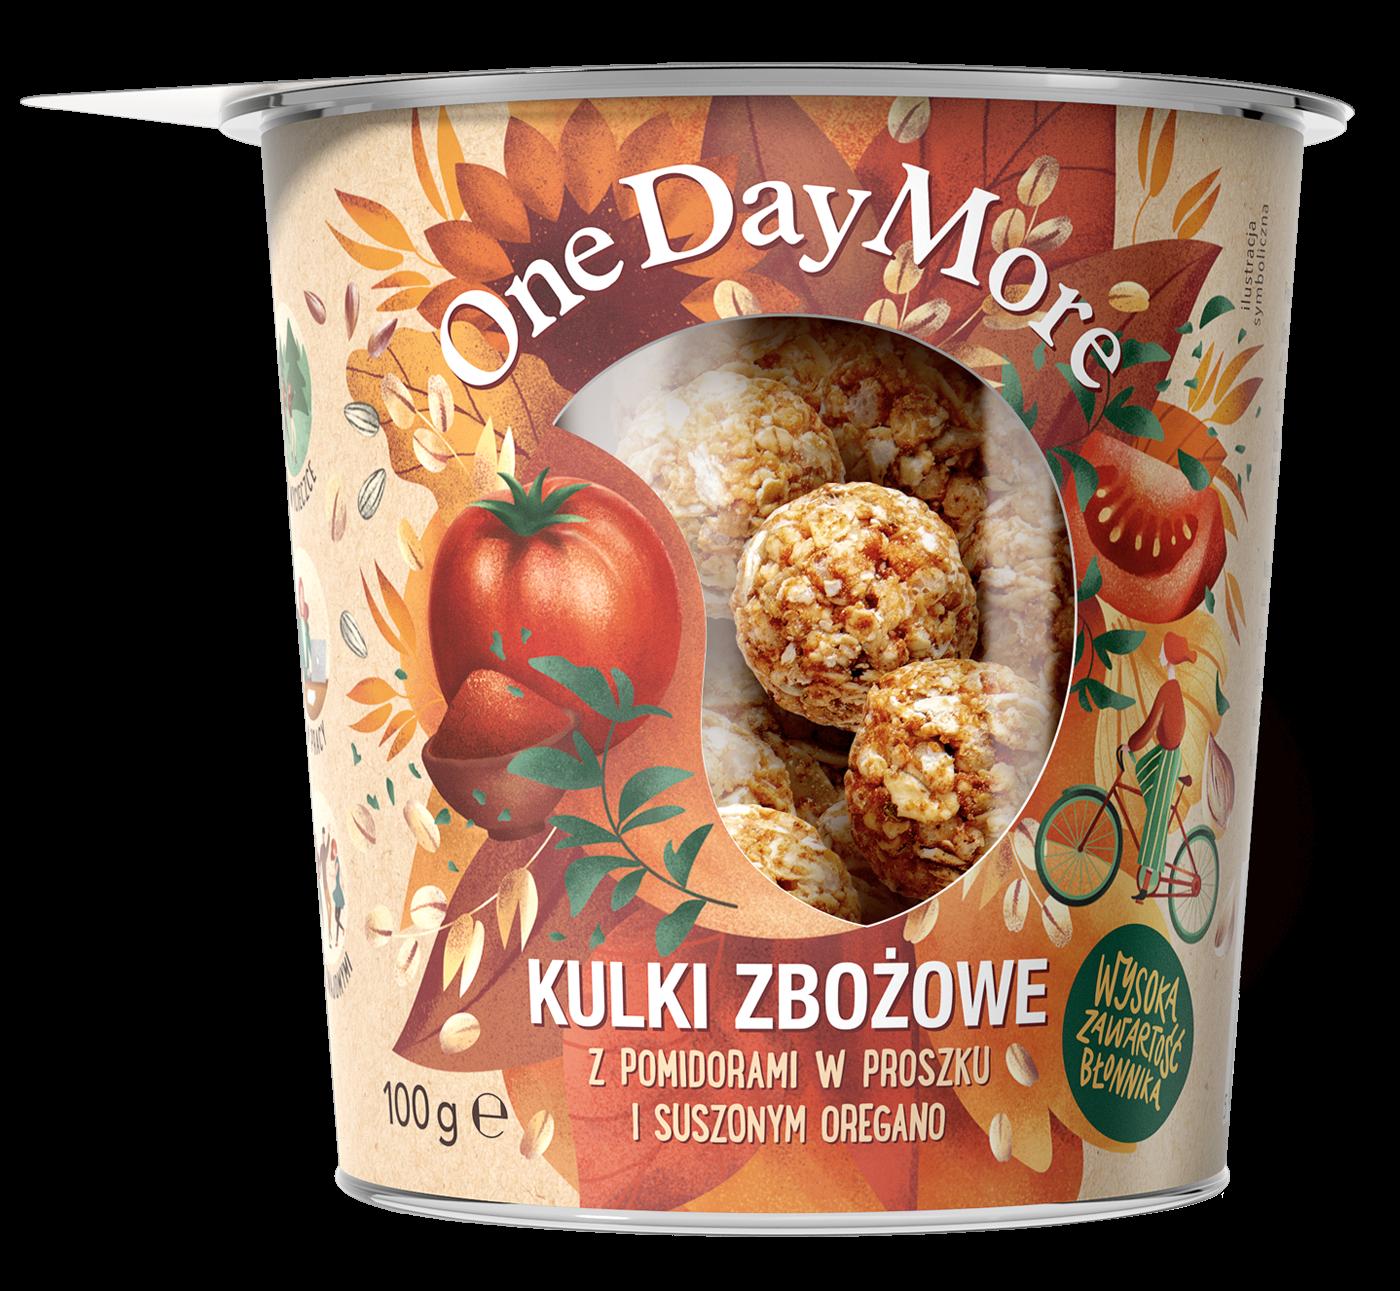 kulki-zbozowe-pomidor-i-oregano-kubek-onedaymore-1400×1291